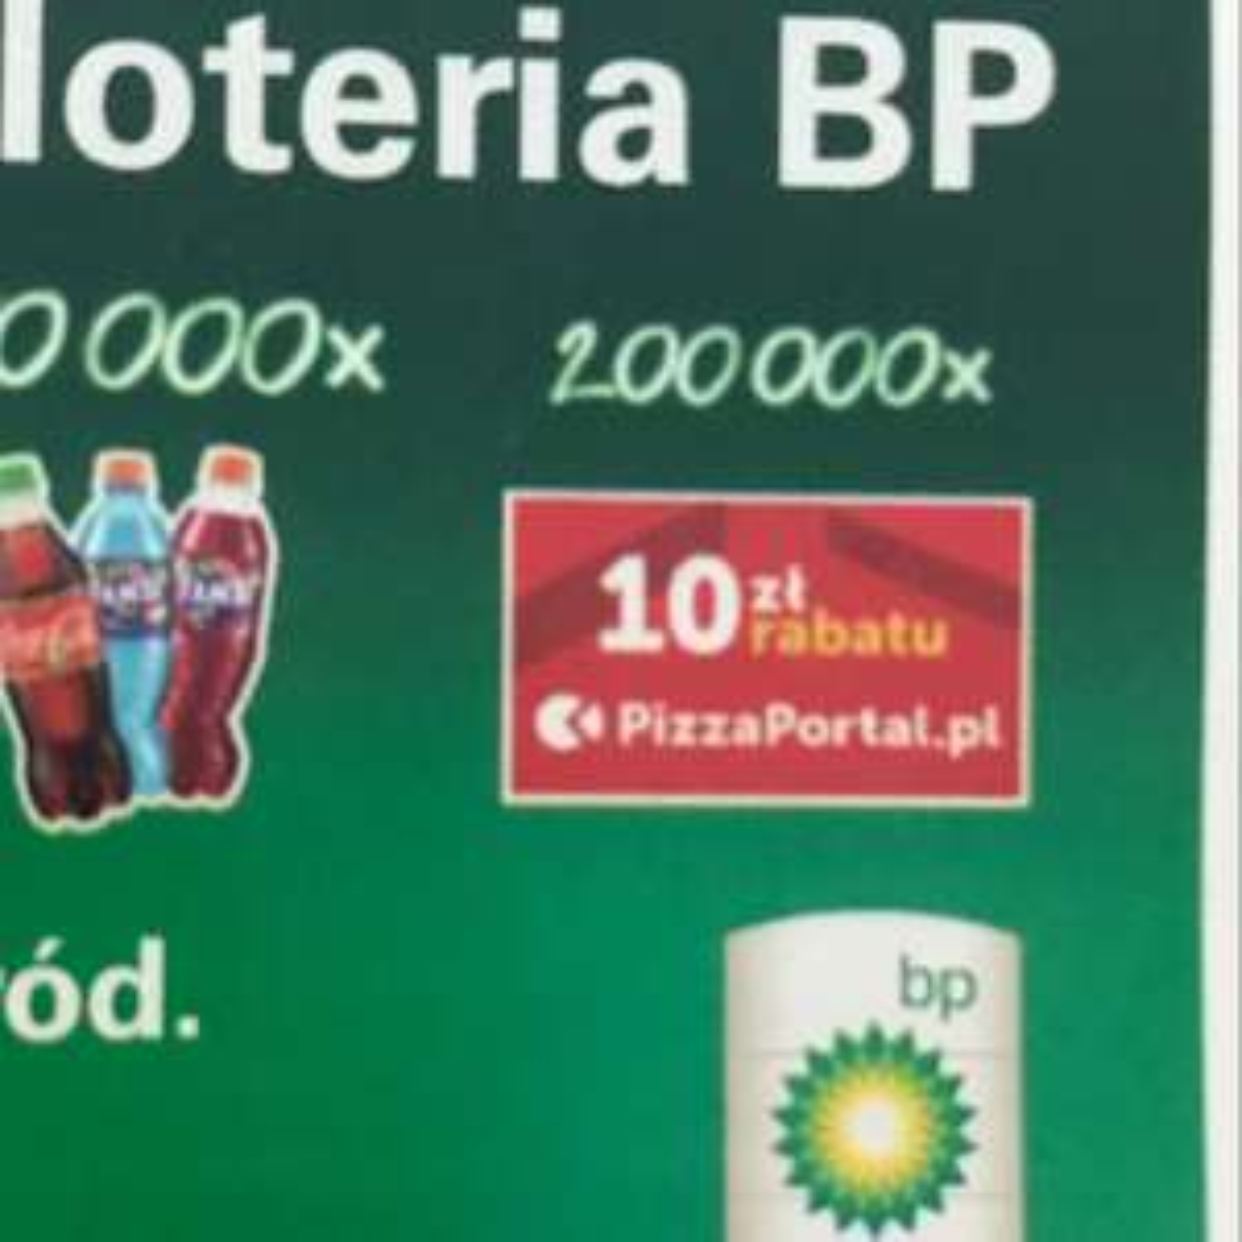 Pizzaportal kod 10 zł, loteria BP